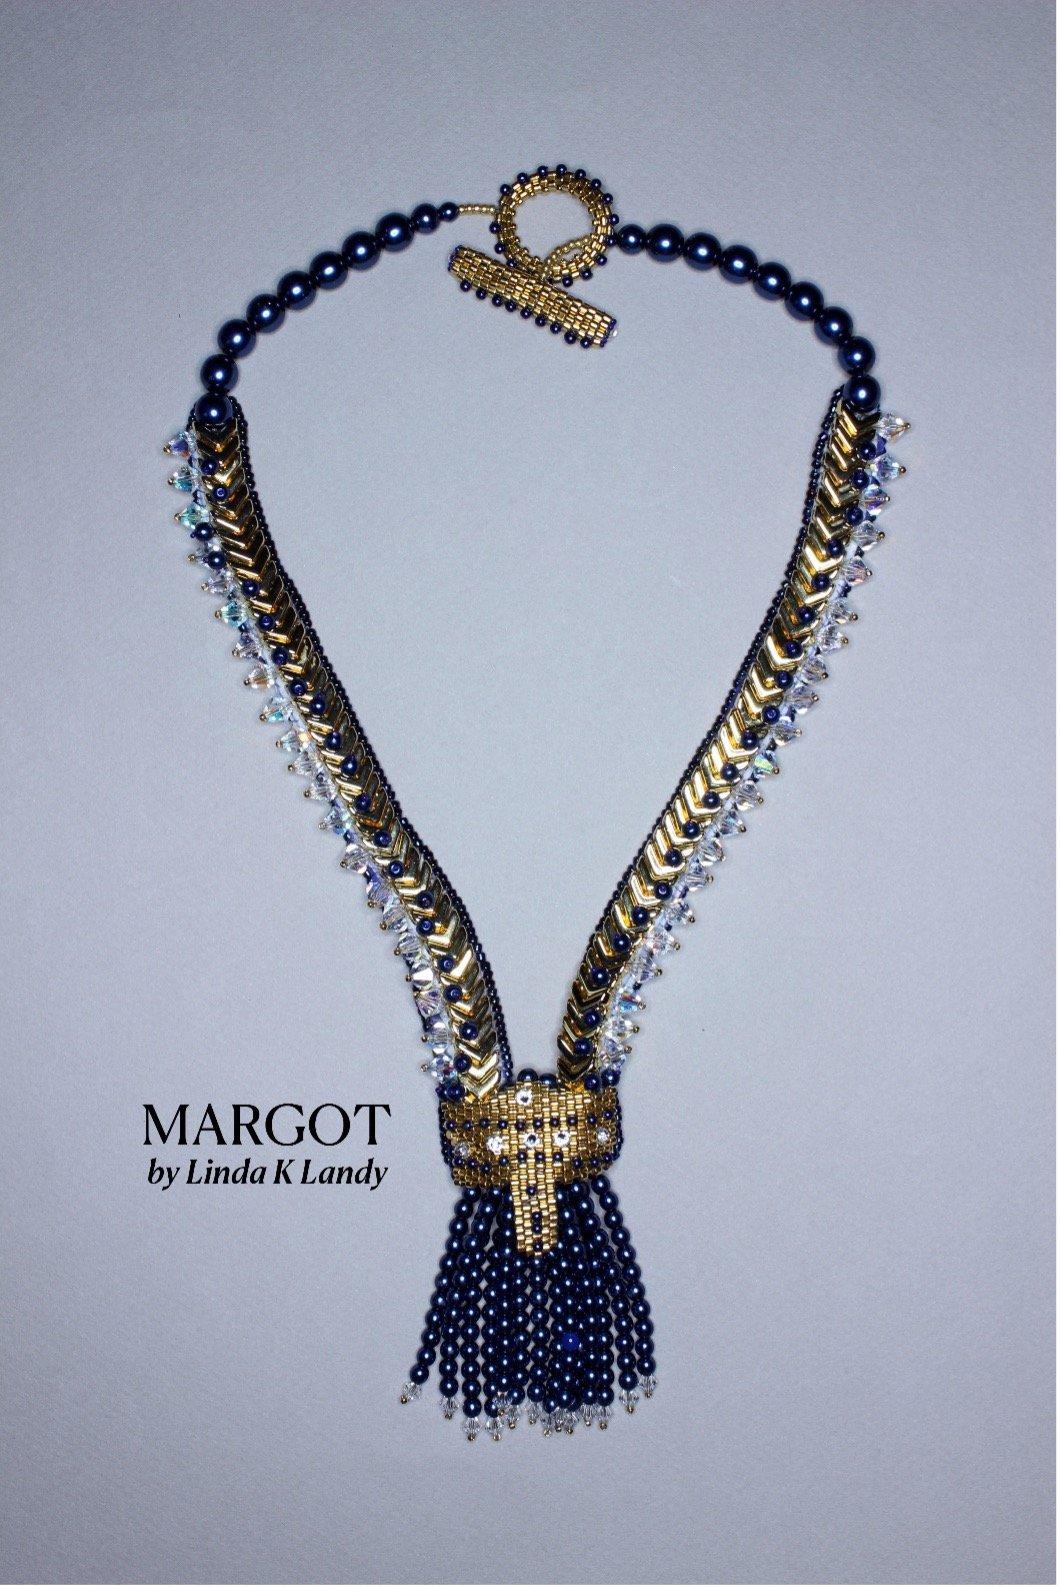 Linda Landy's Margo necklace